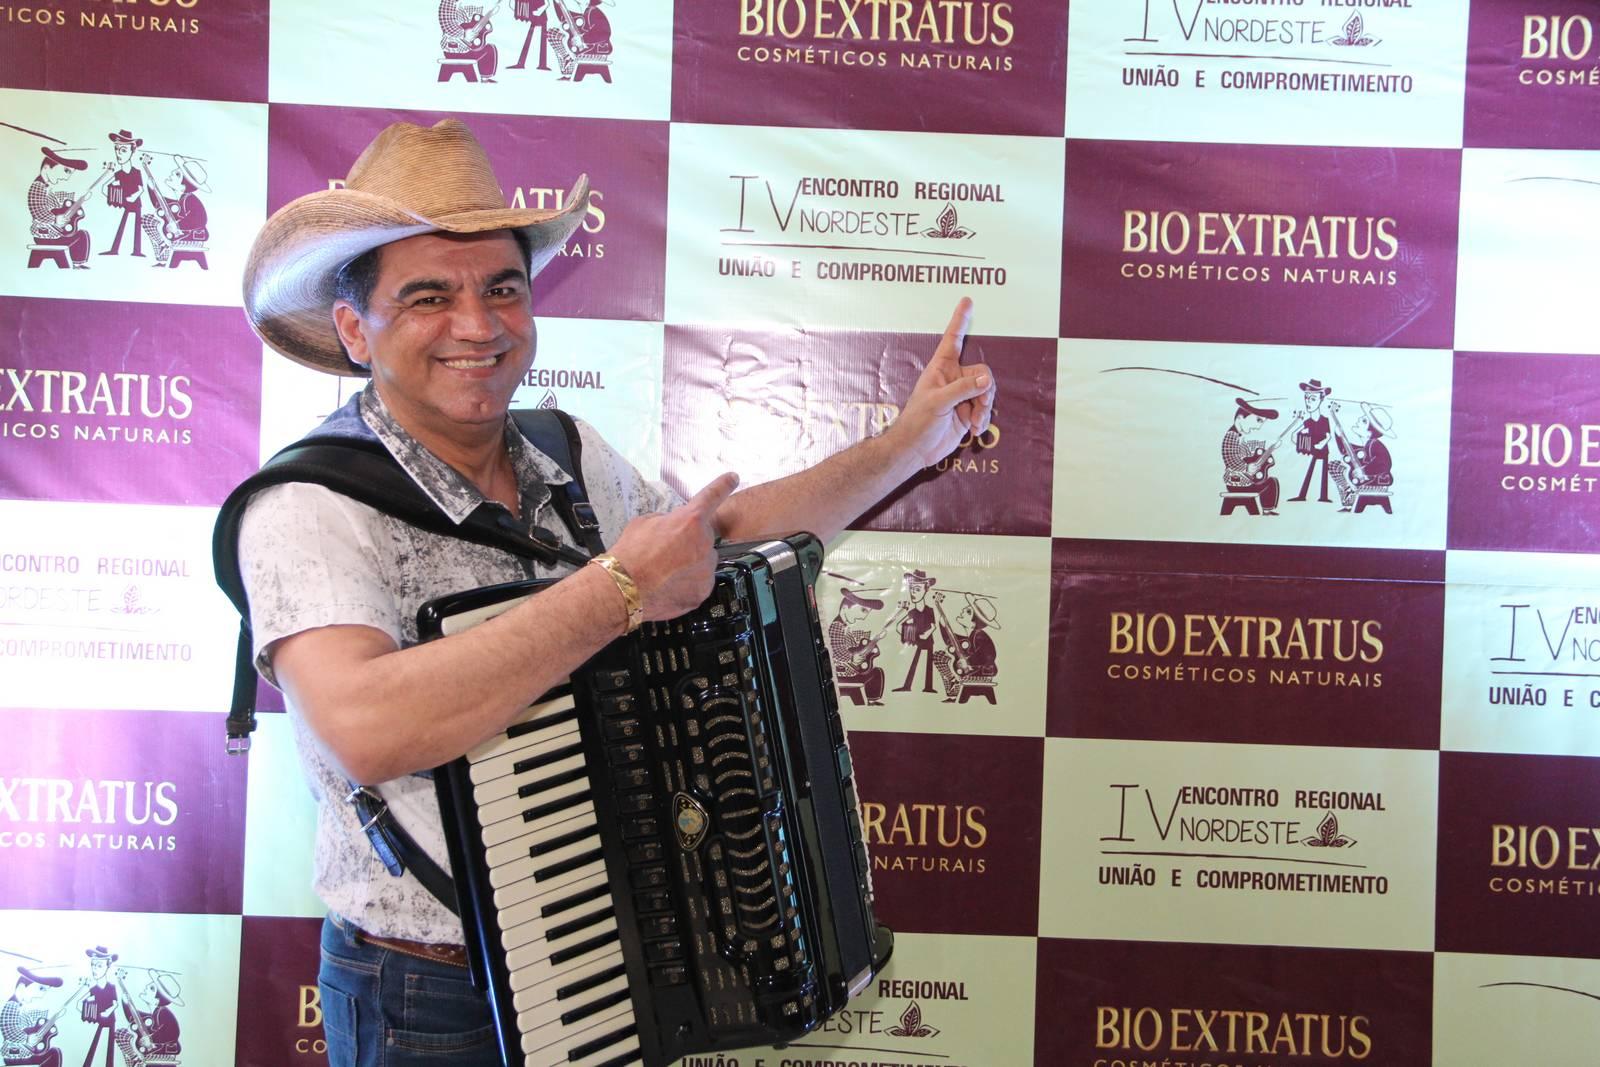 IV Encontro Regional do Nordeste - Bio Extratus (117)